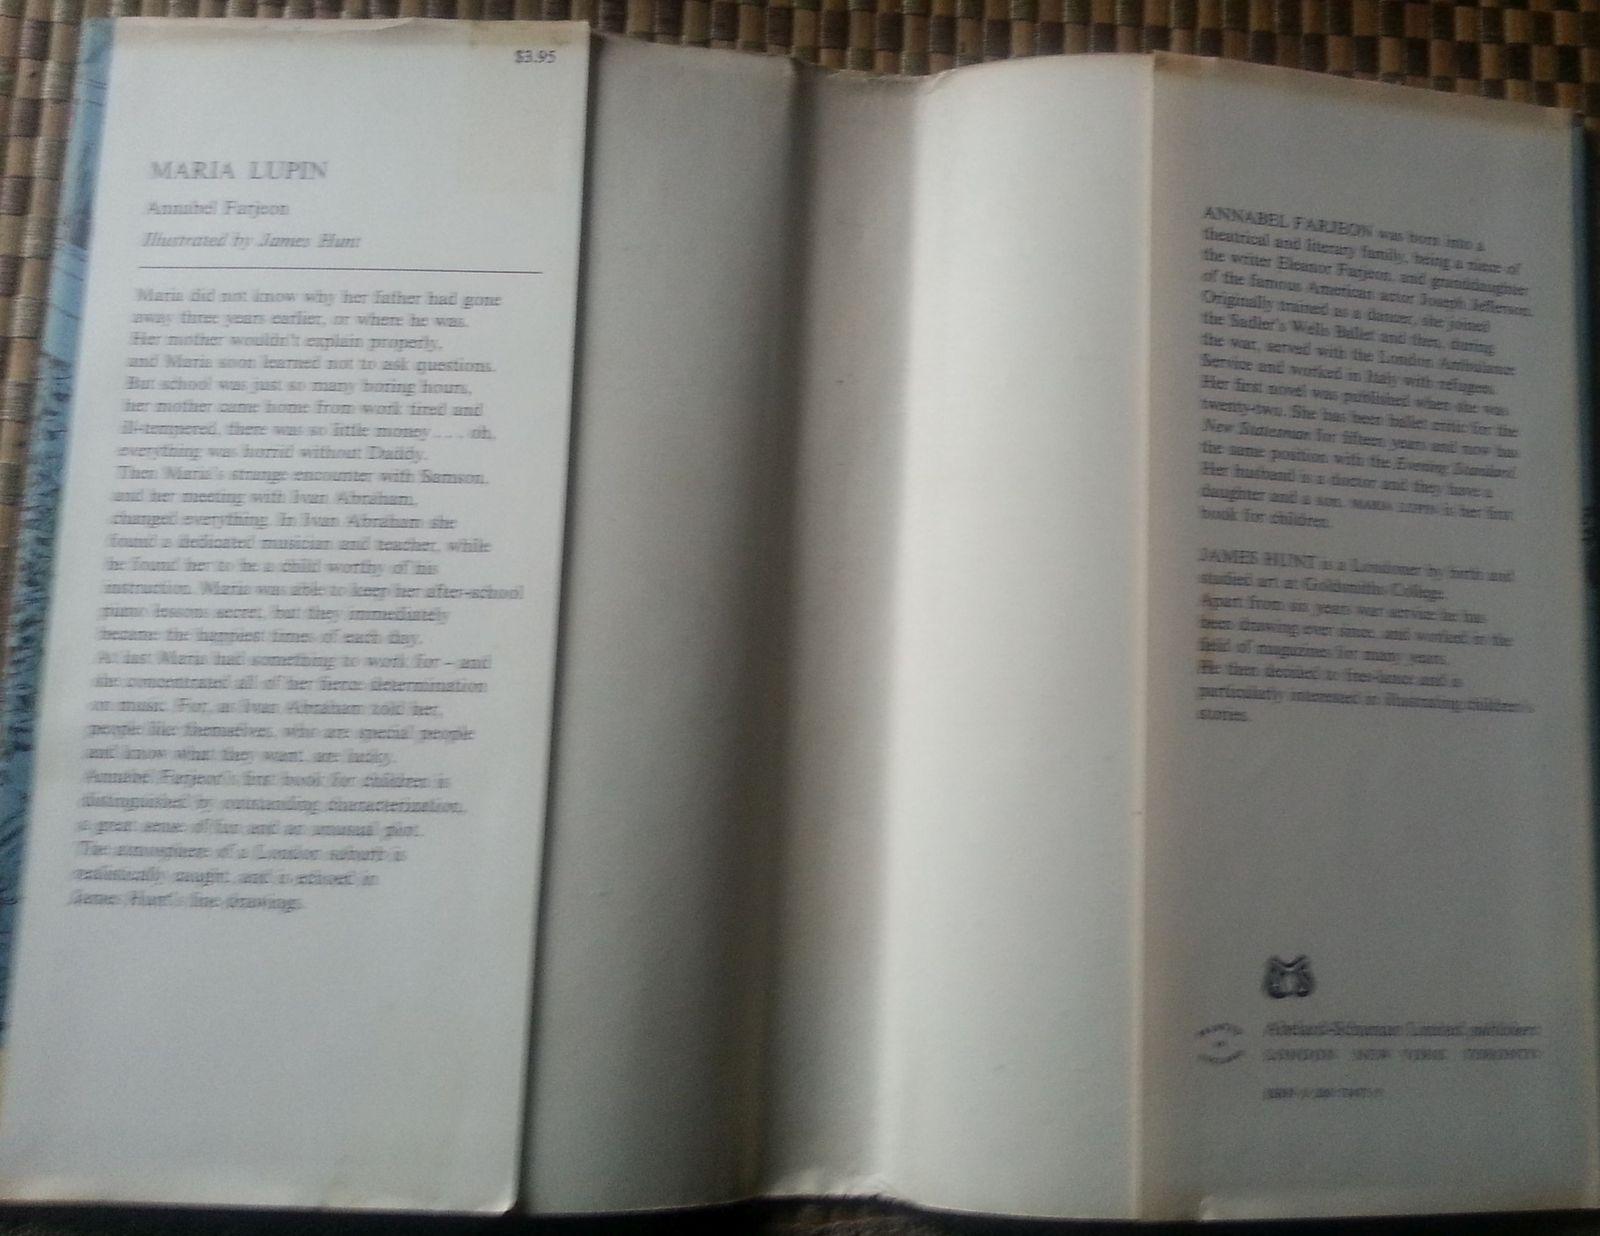 Maria Lupin by Annabel Farjeon 1970 HBDJ Piano Prodigy